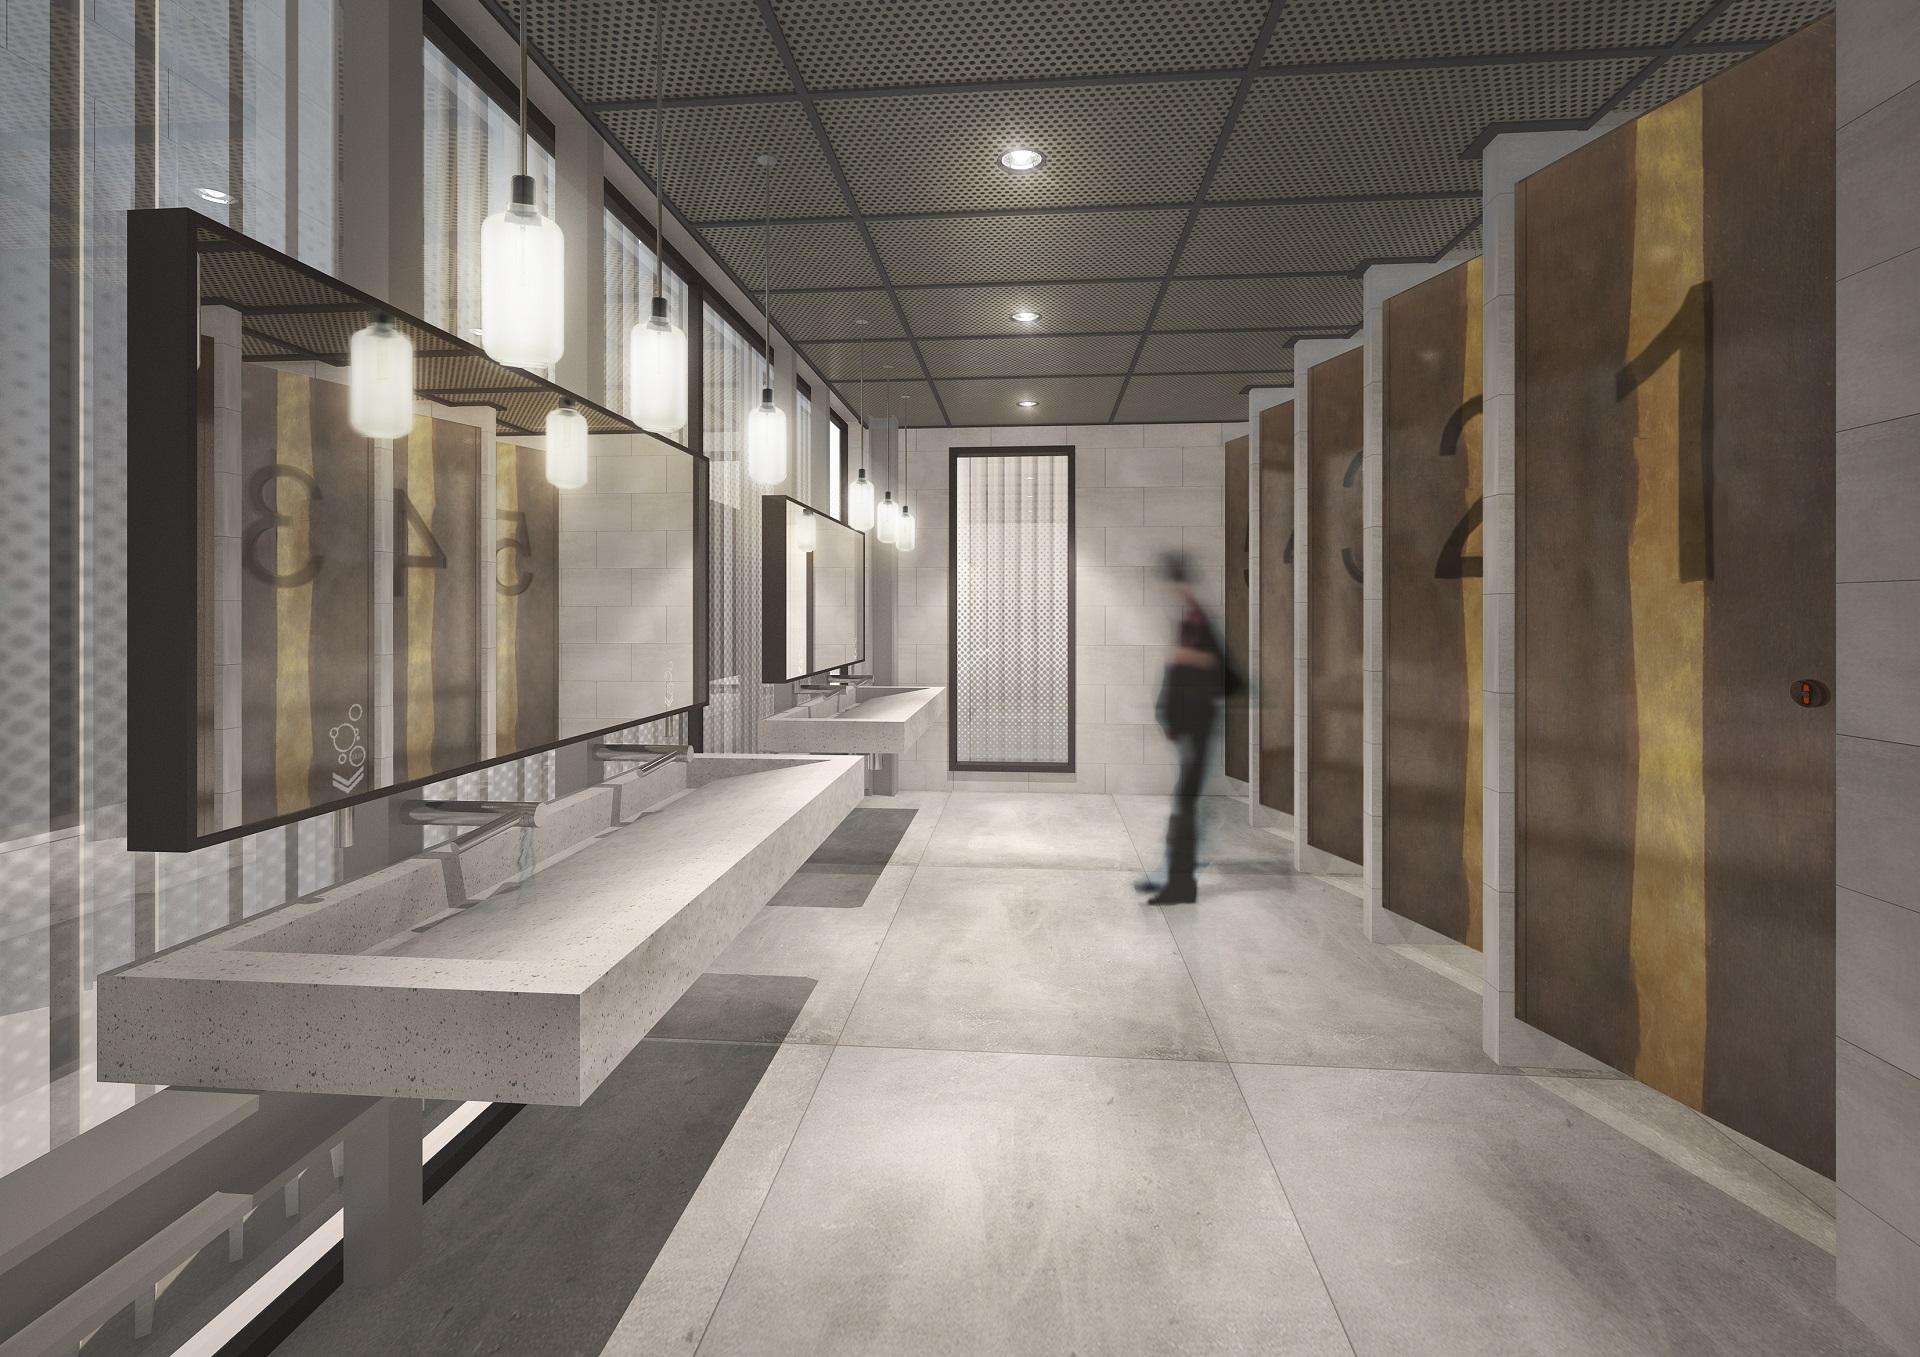 Meraas - Cabana Public Toilet